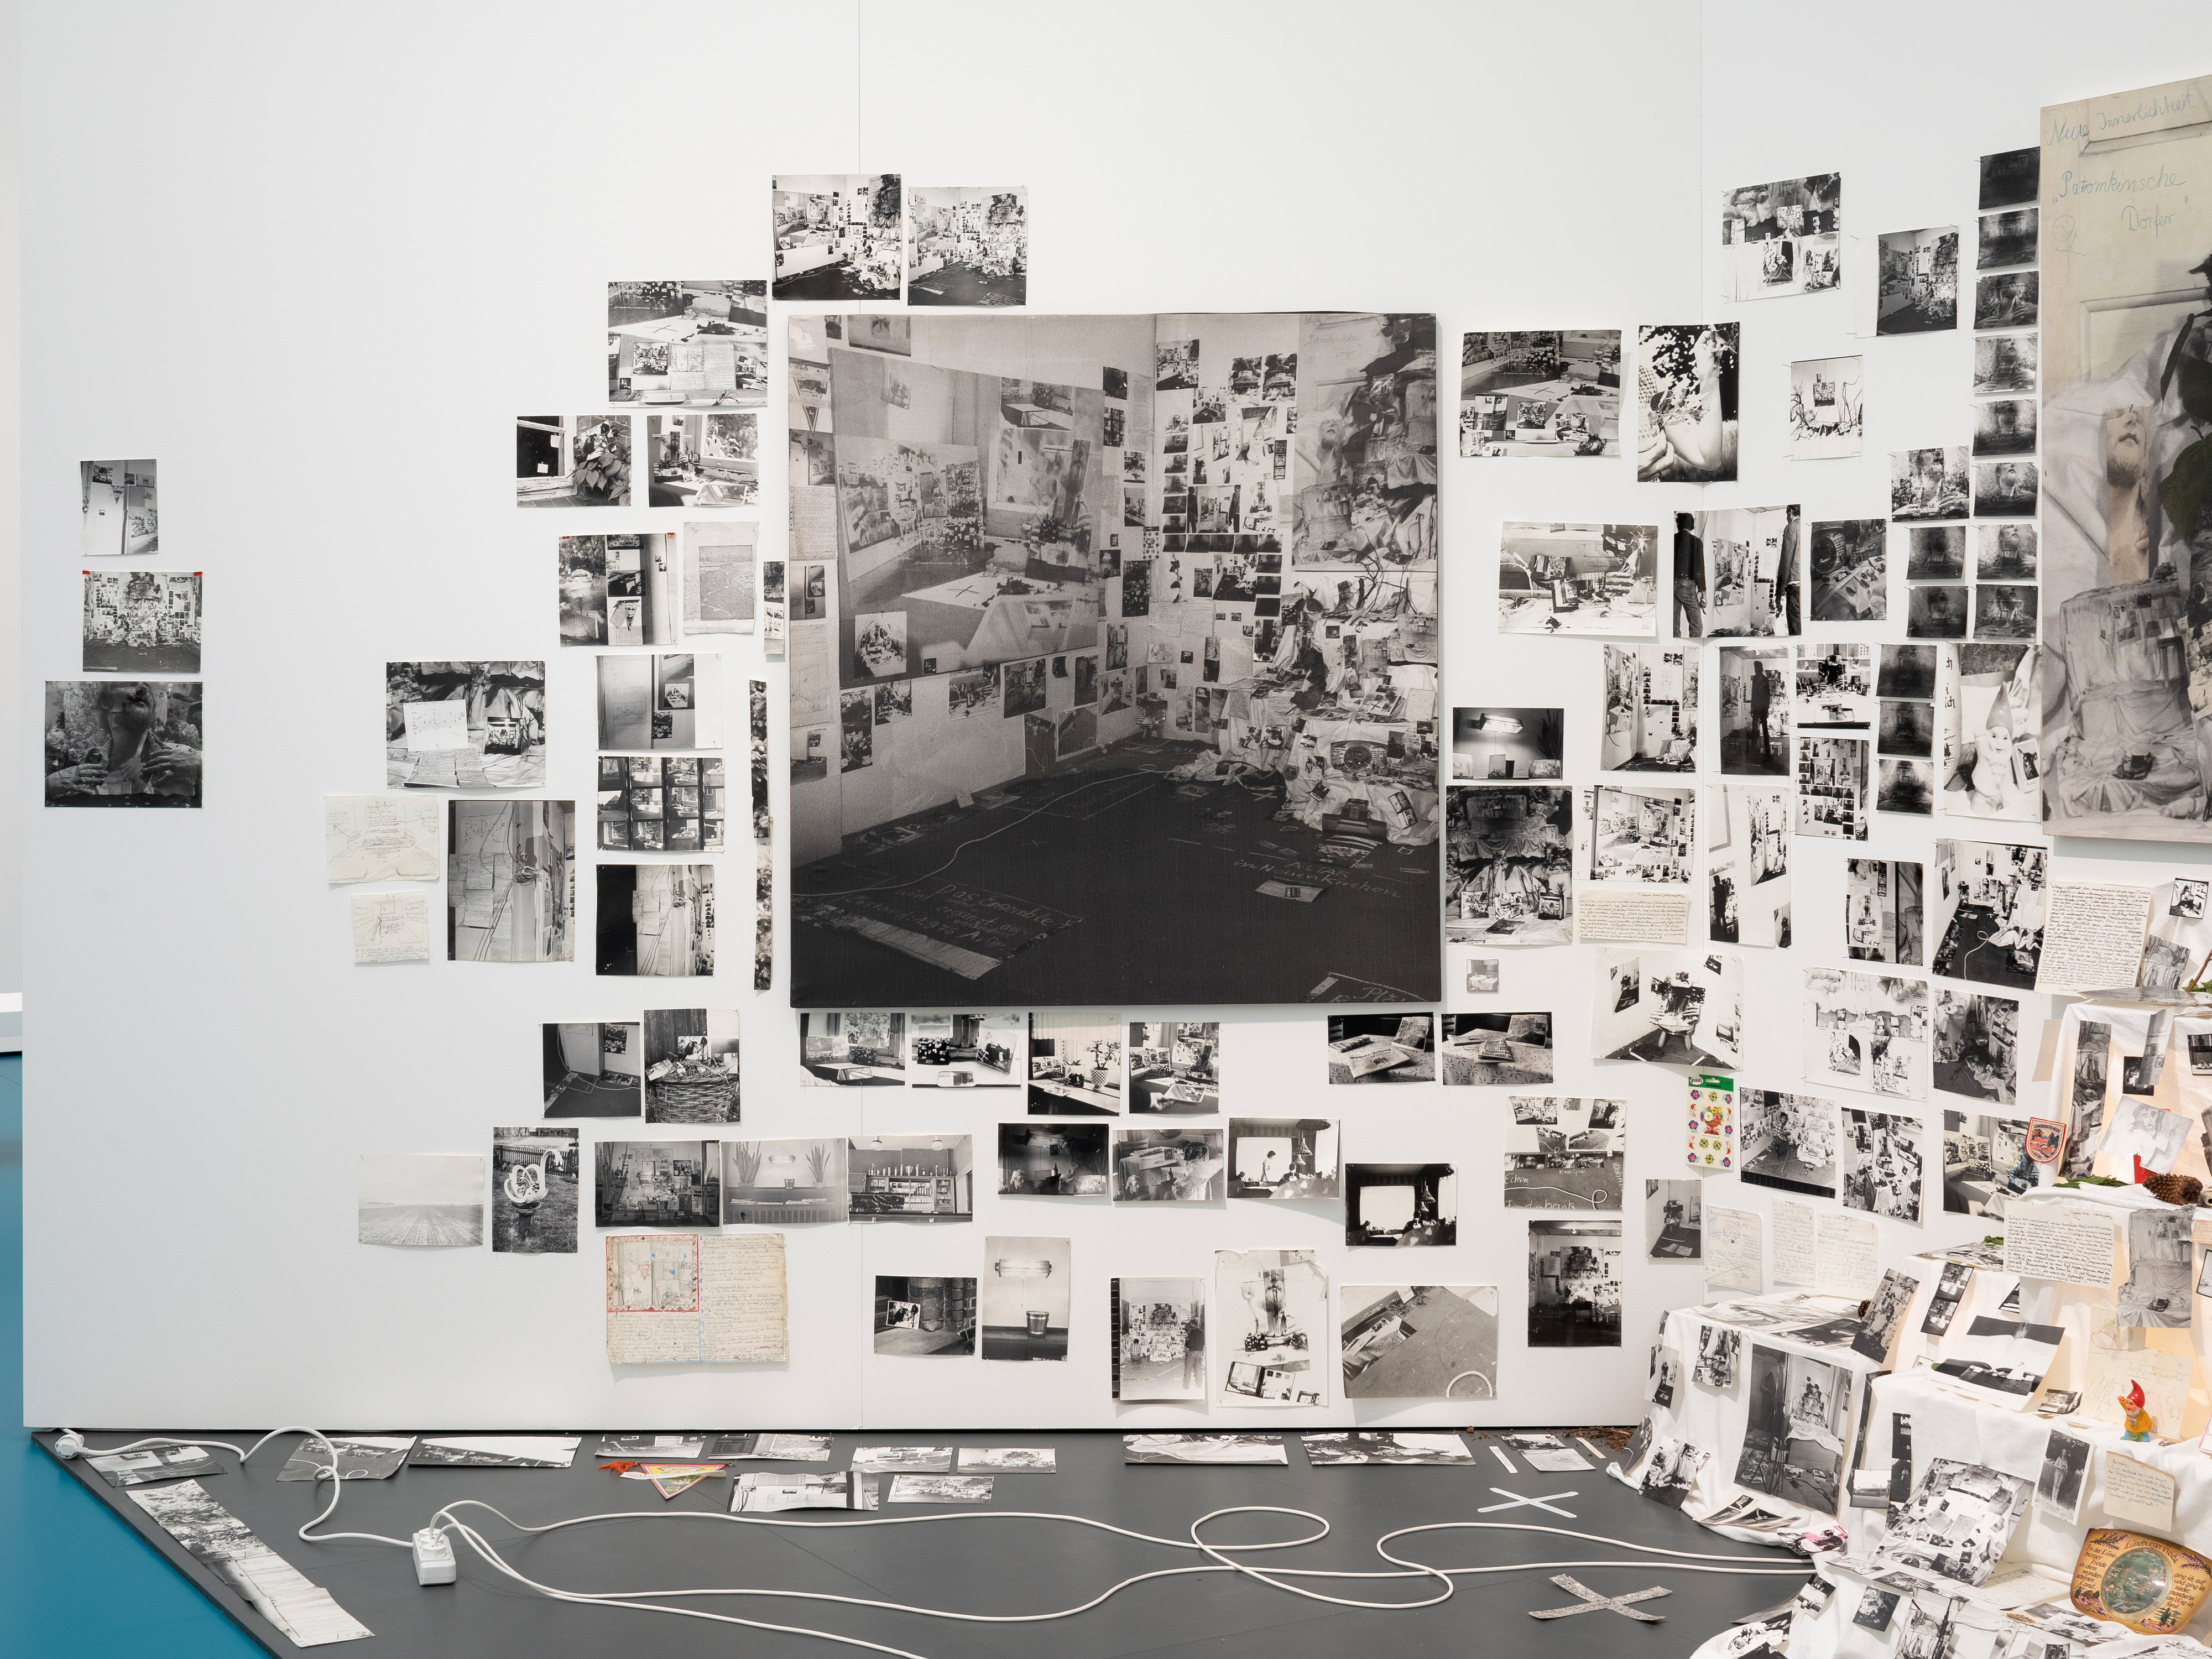 Galerie Barbara Thumm \ Estate Anna Oppermann